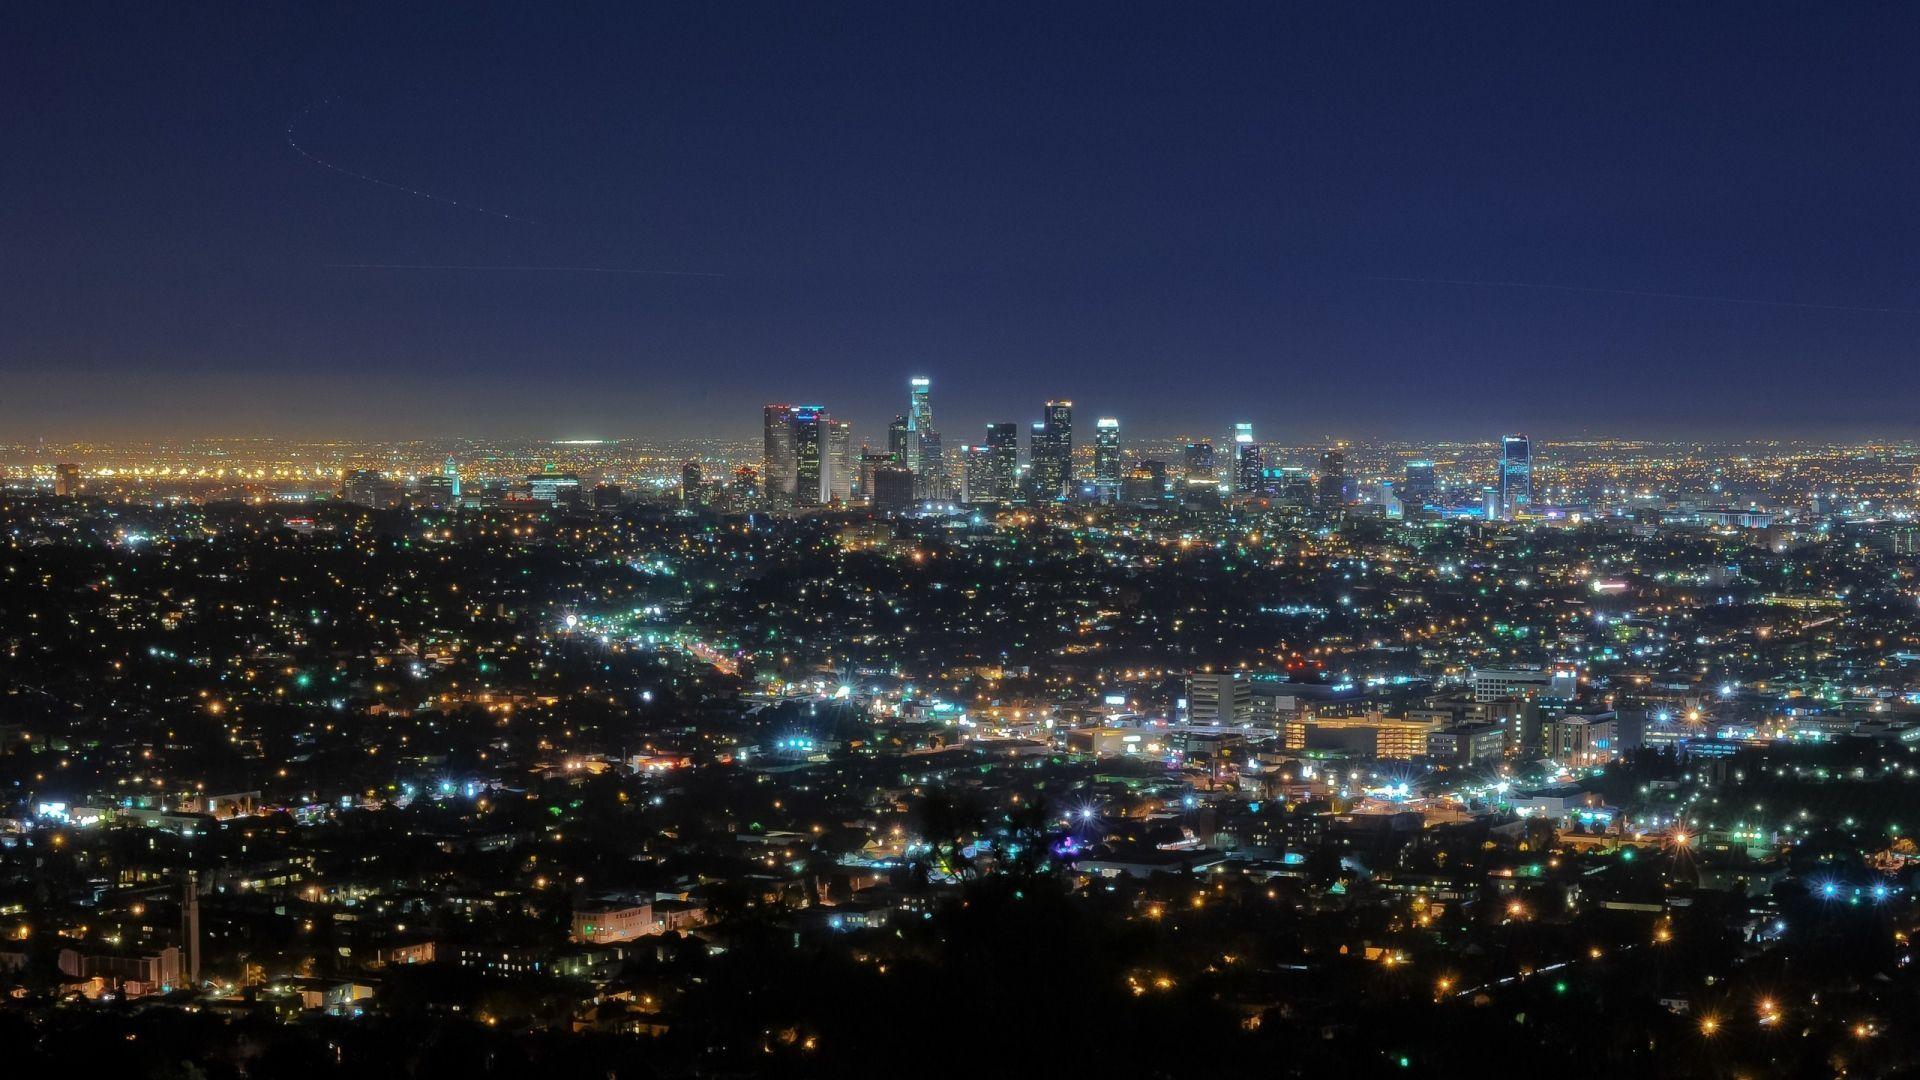 1080p California Wallpaper Hd 2 California Wallpaper Los